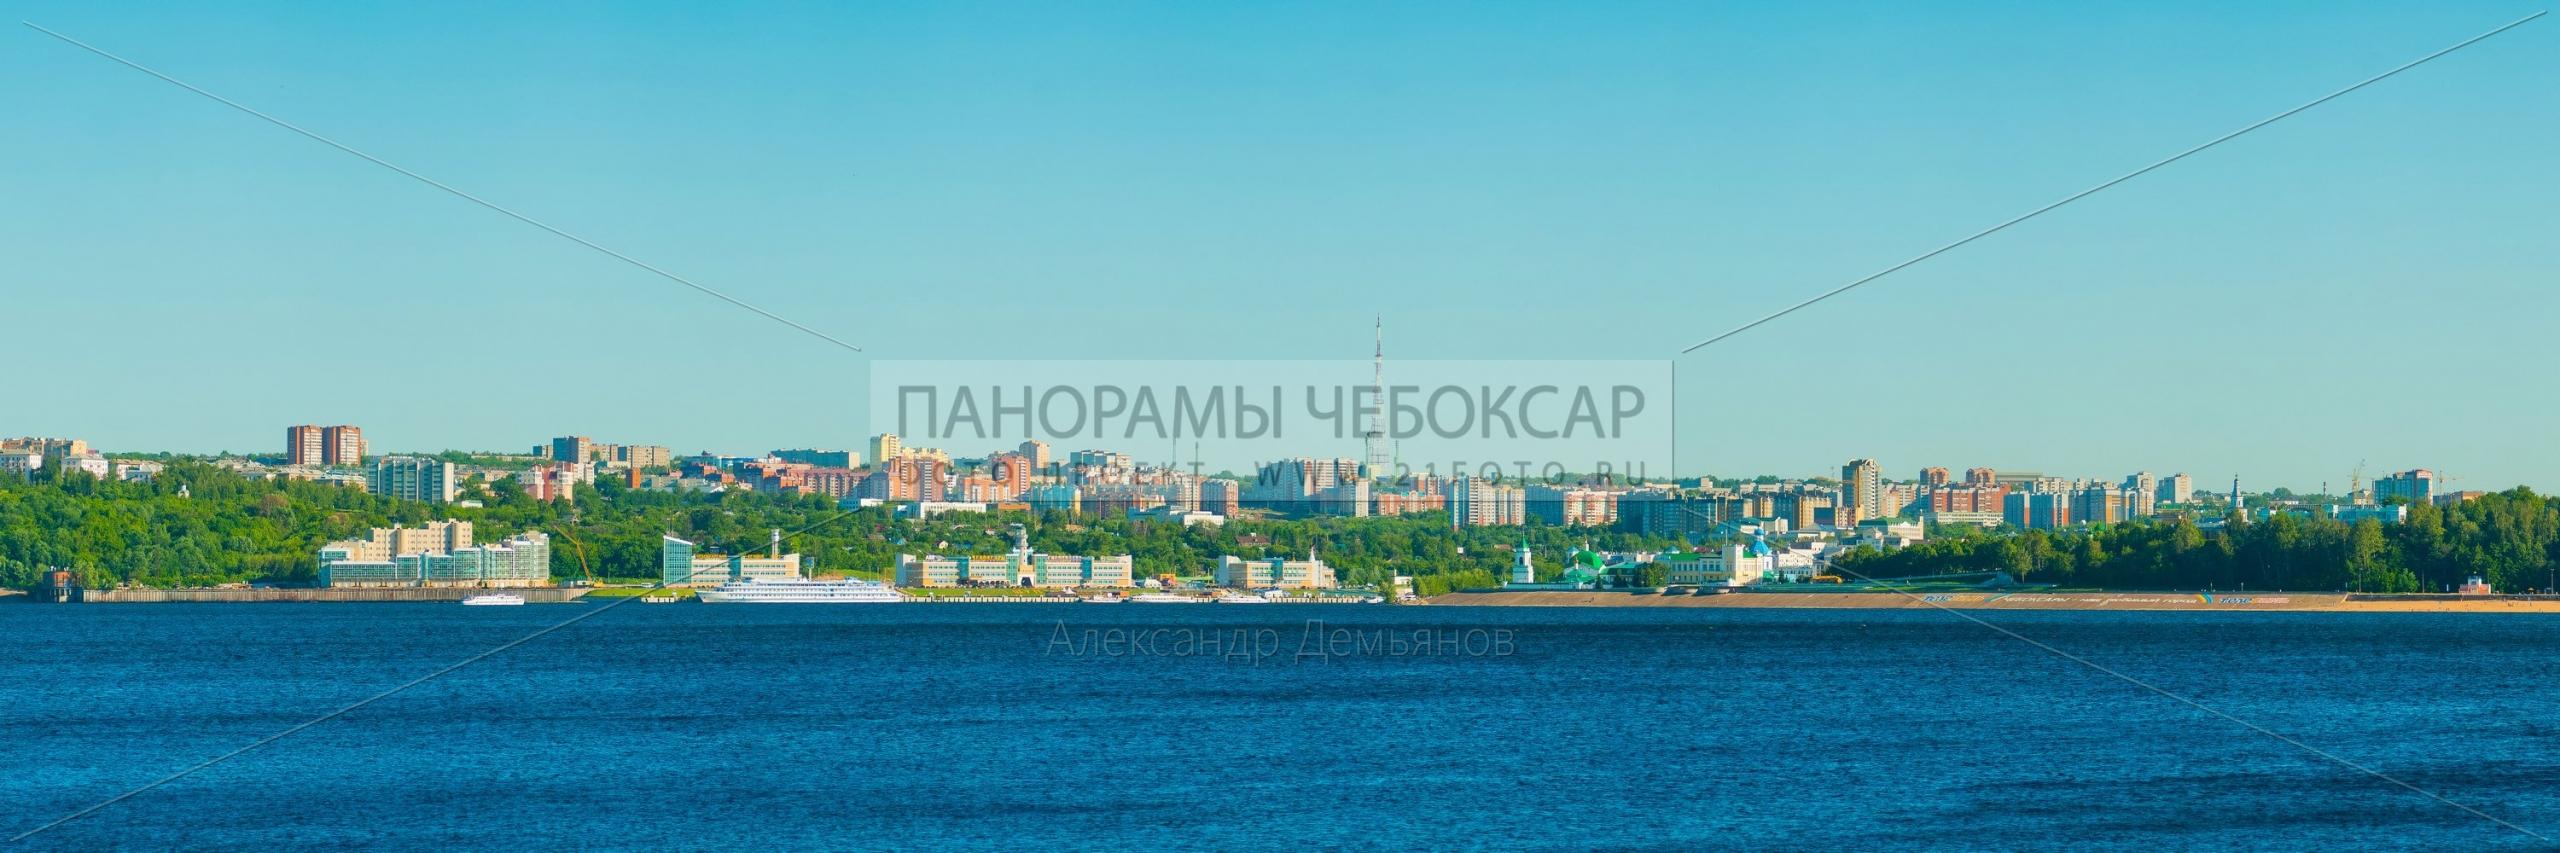 Вид на Чебоксары с левого берега Волги днём